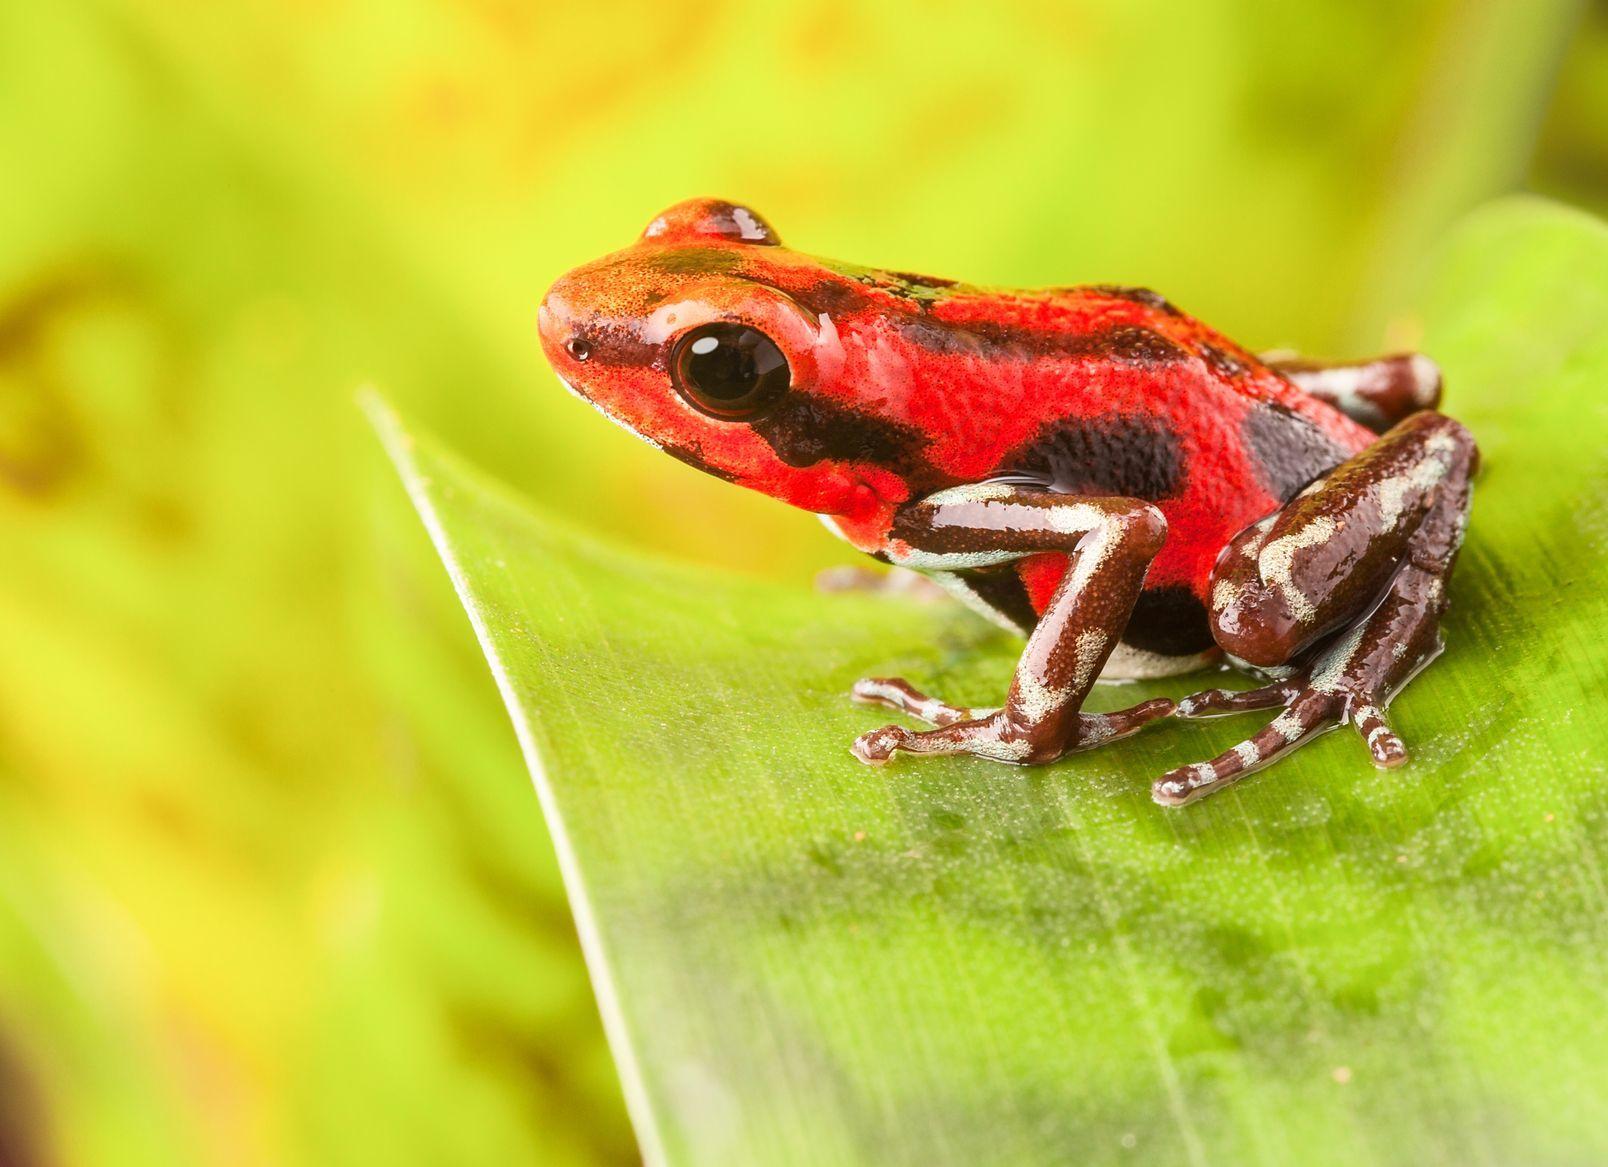 Červená pralesnička v Panamě | dirkercken/123RF.com